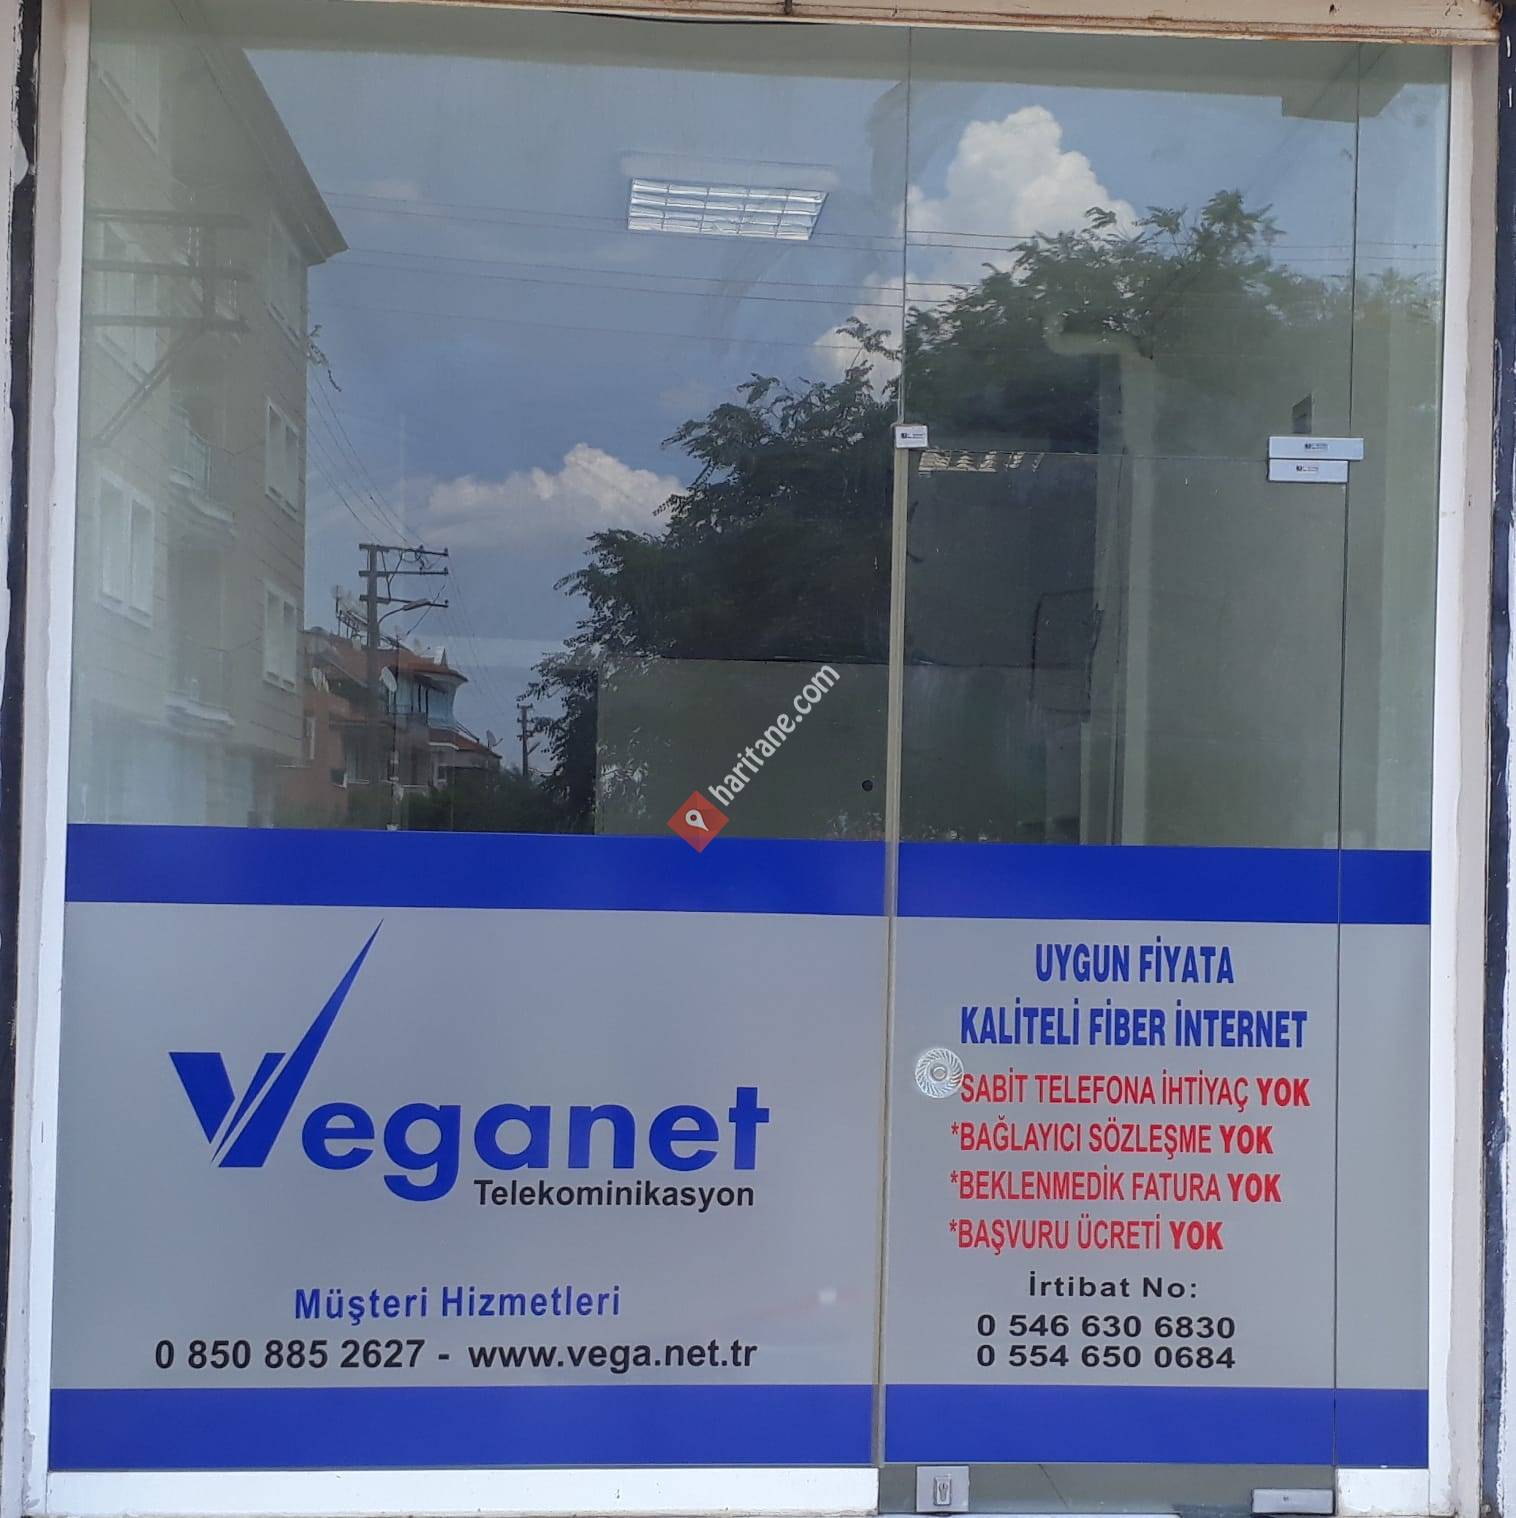 Dalamannet Veganet Acentası